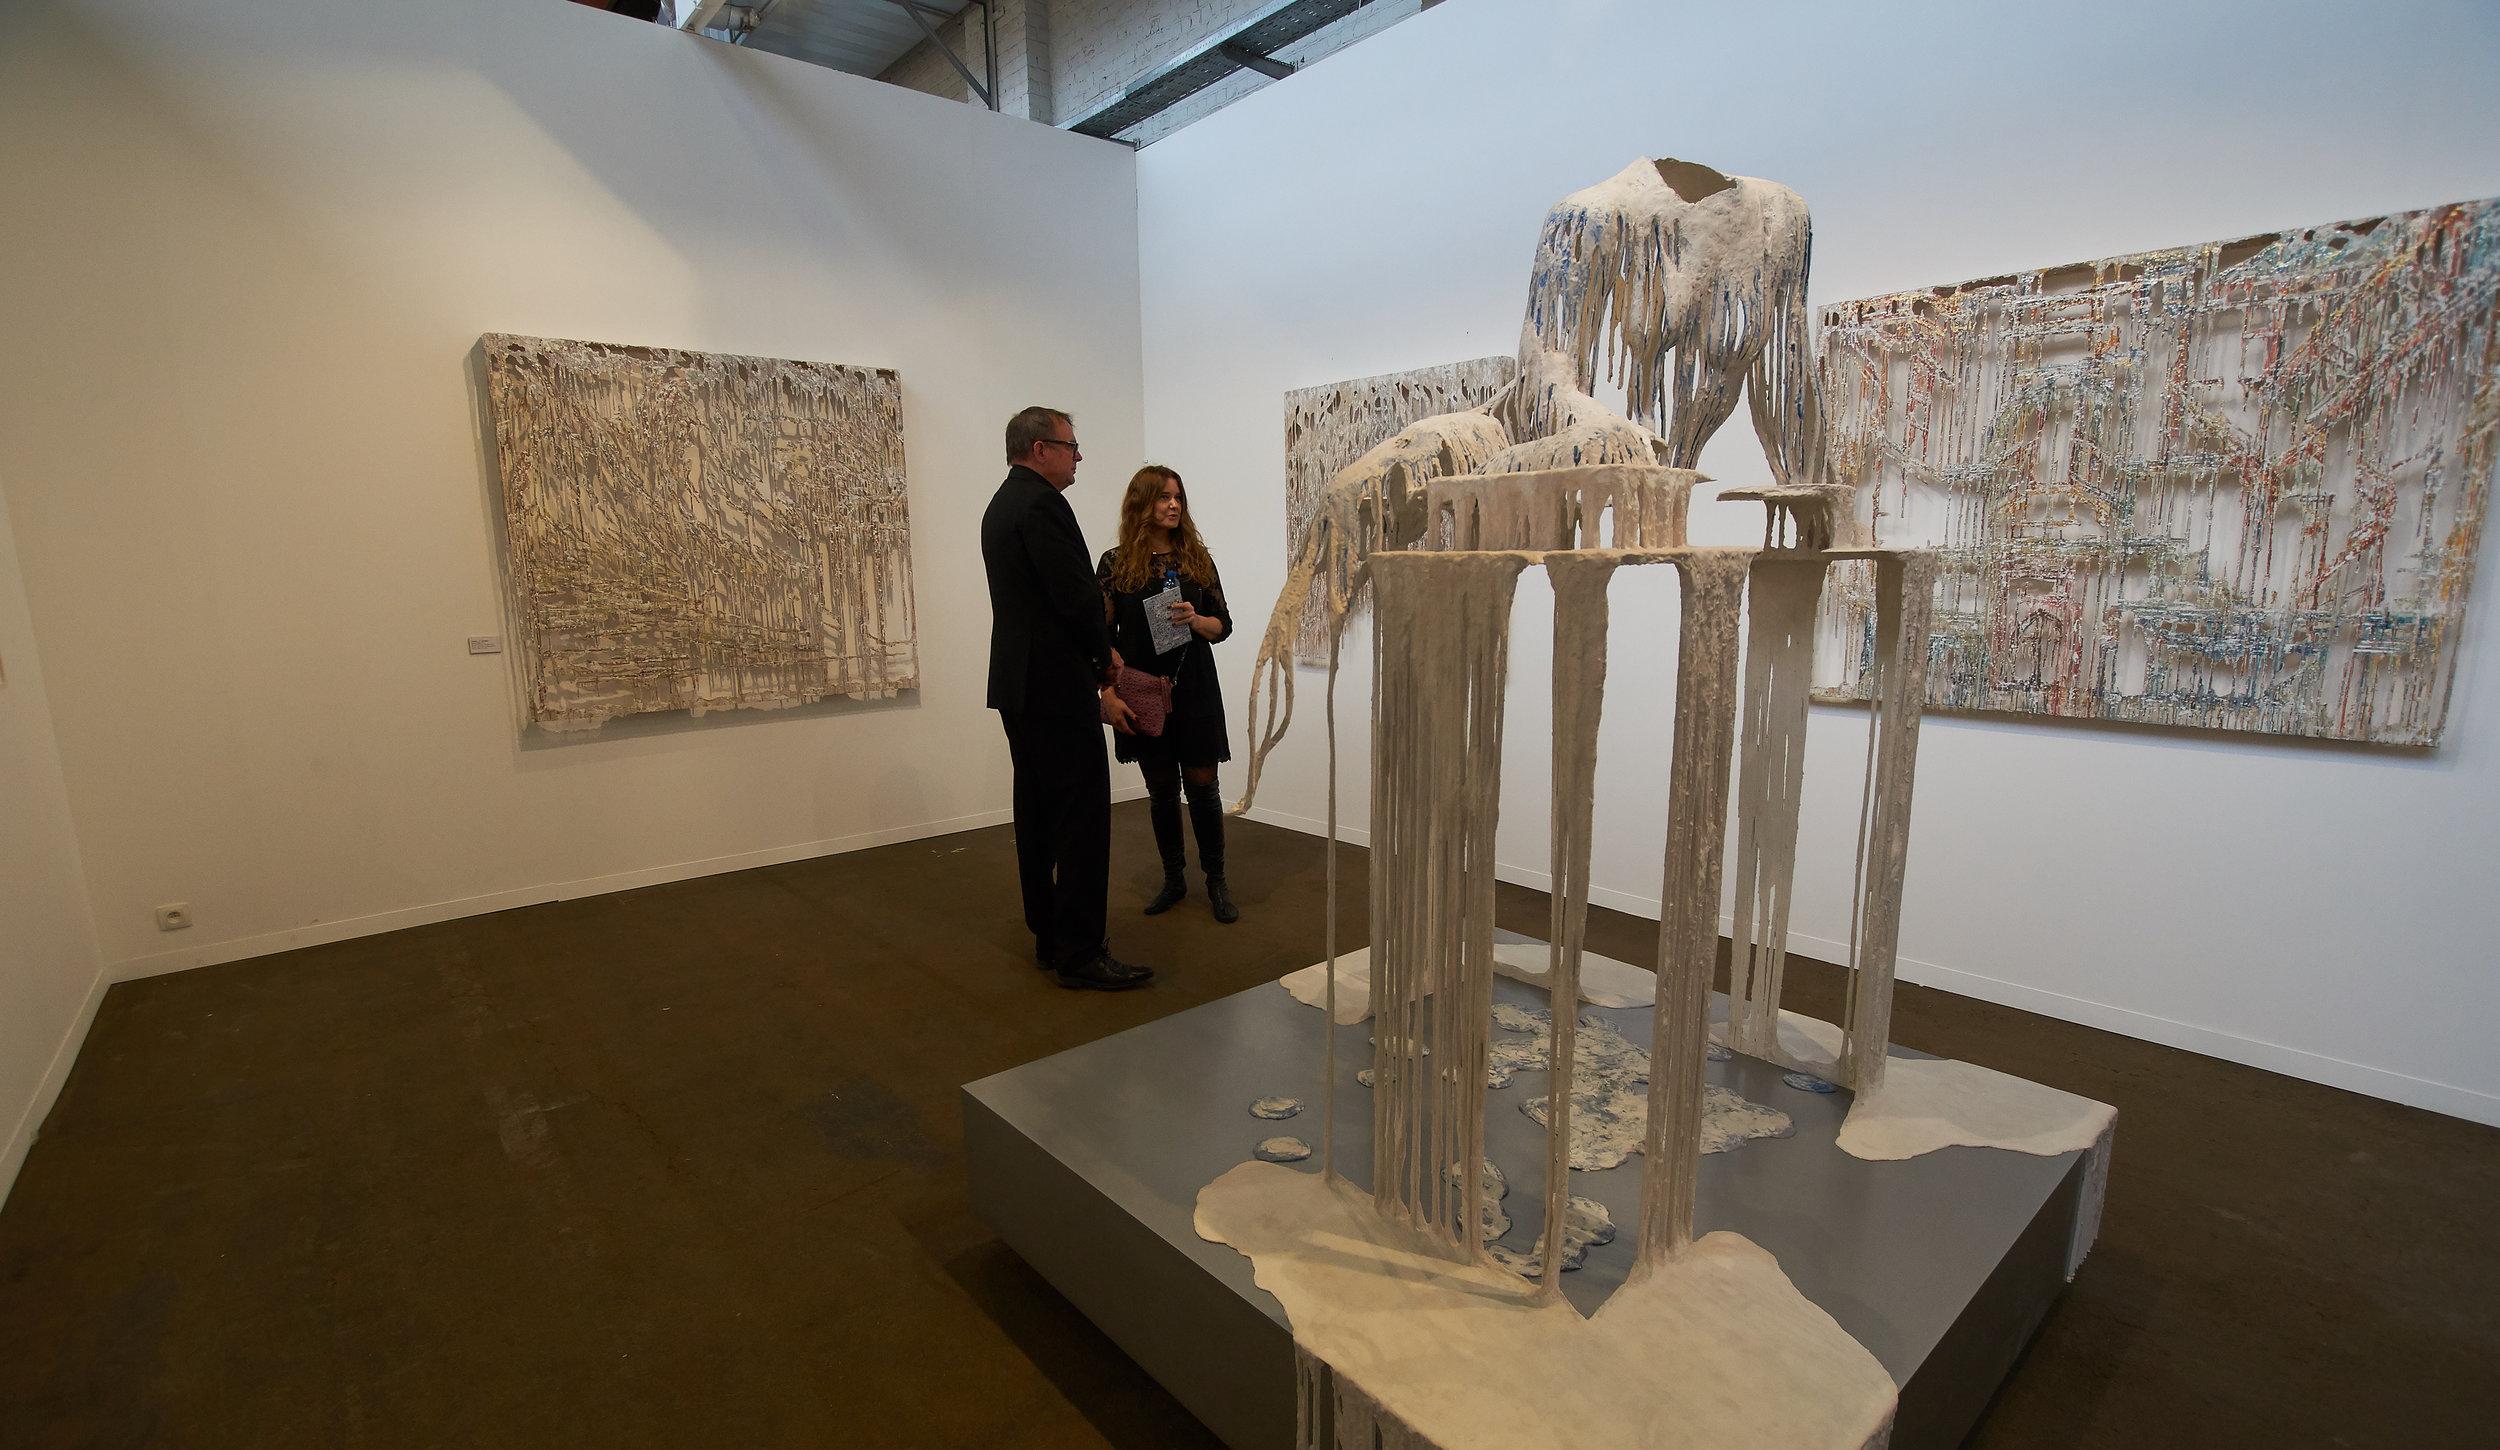 Diana Al Hadid's work at Gallery Brandstrup